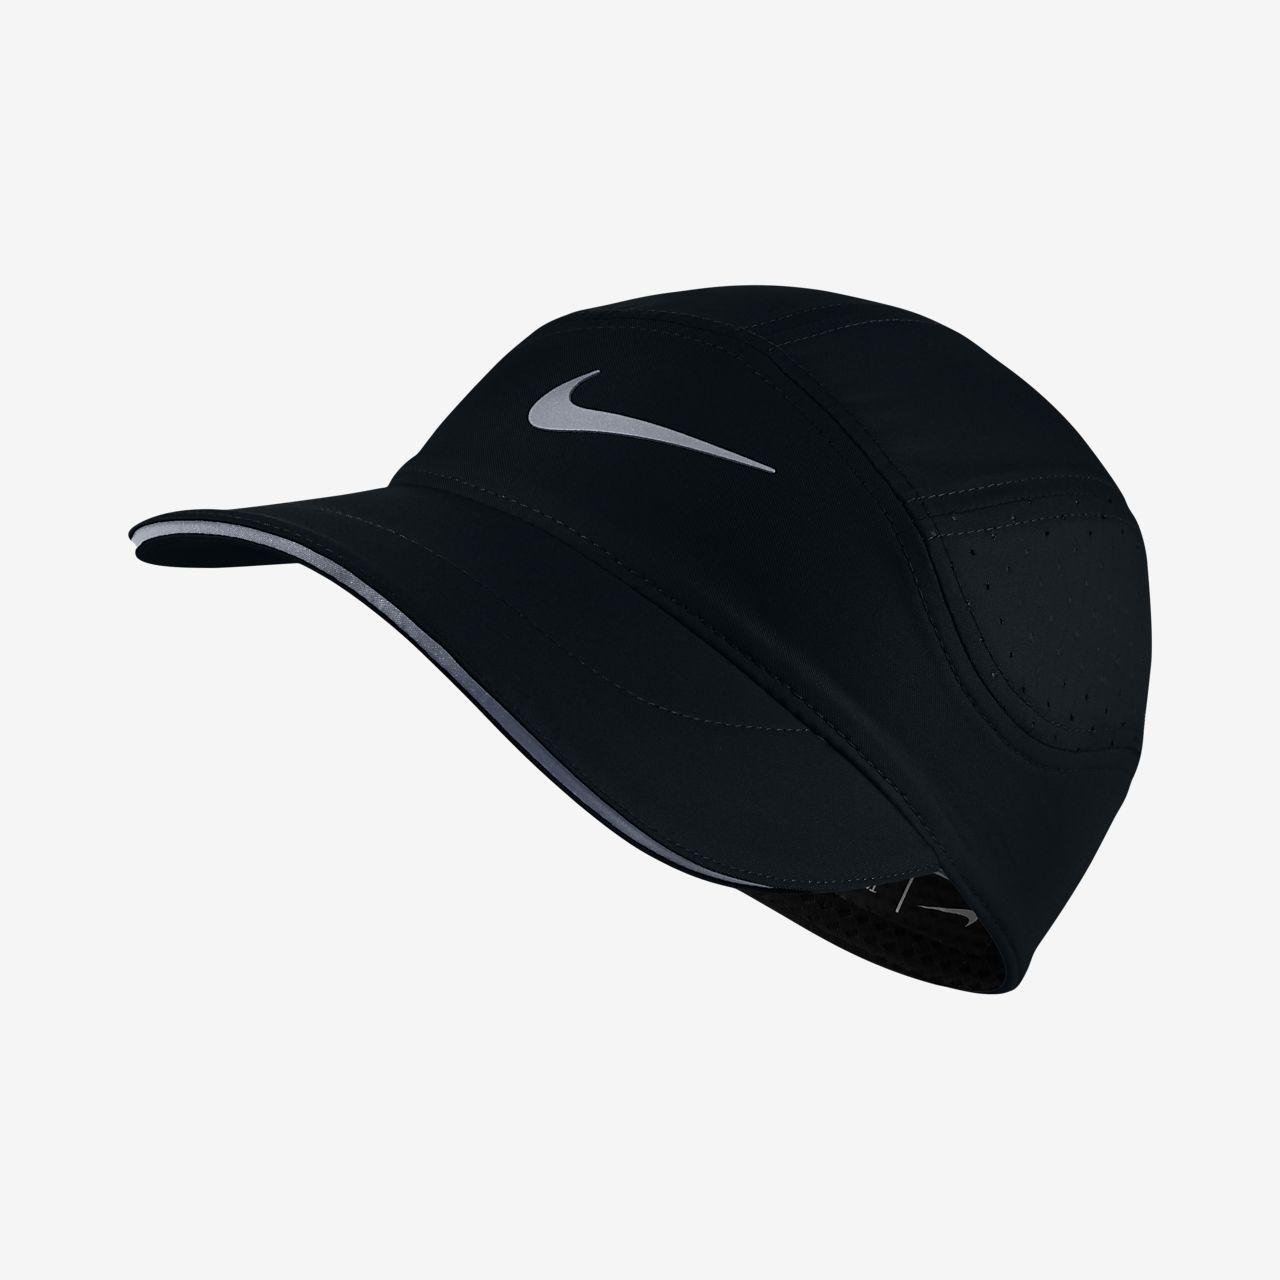 ... usa nike aerobill womens adjustable running hat dd613 04f03 ... 5b0c0b7dd8c